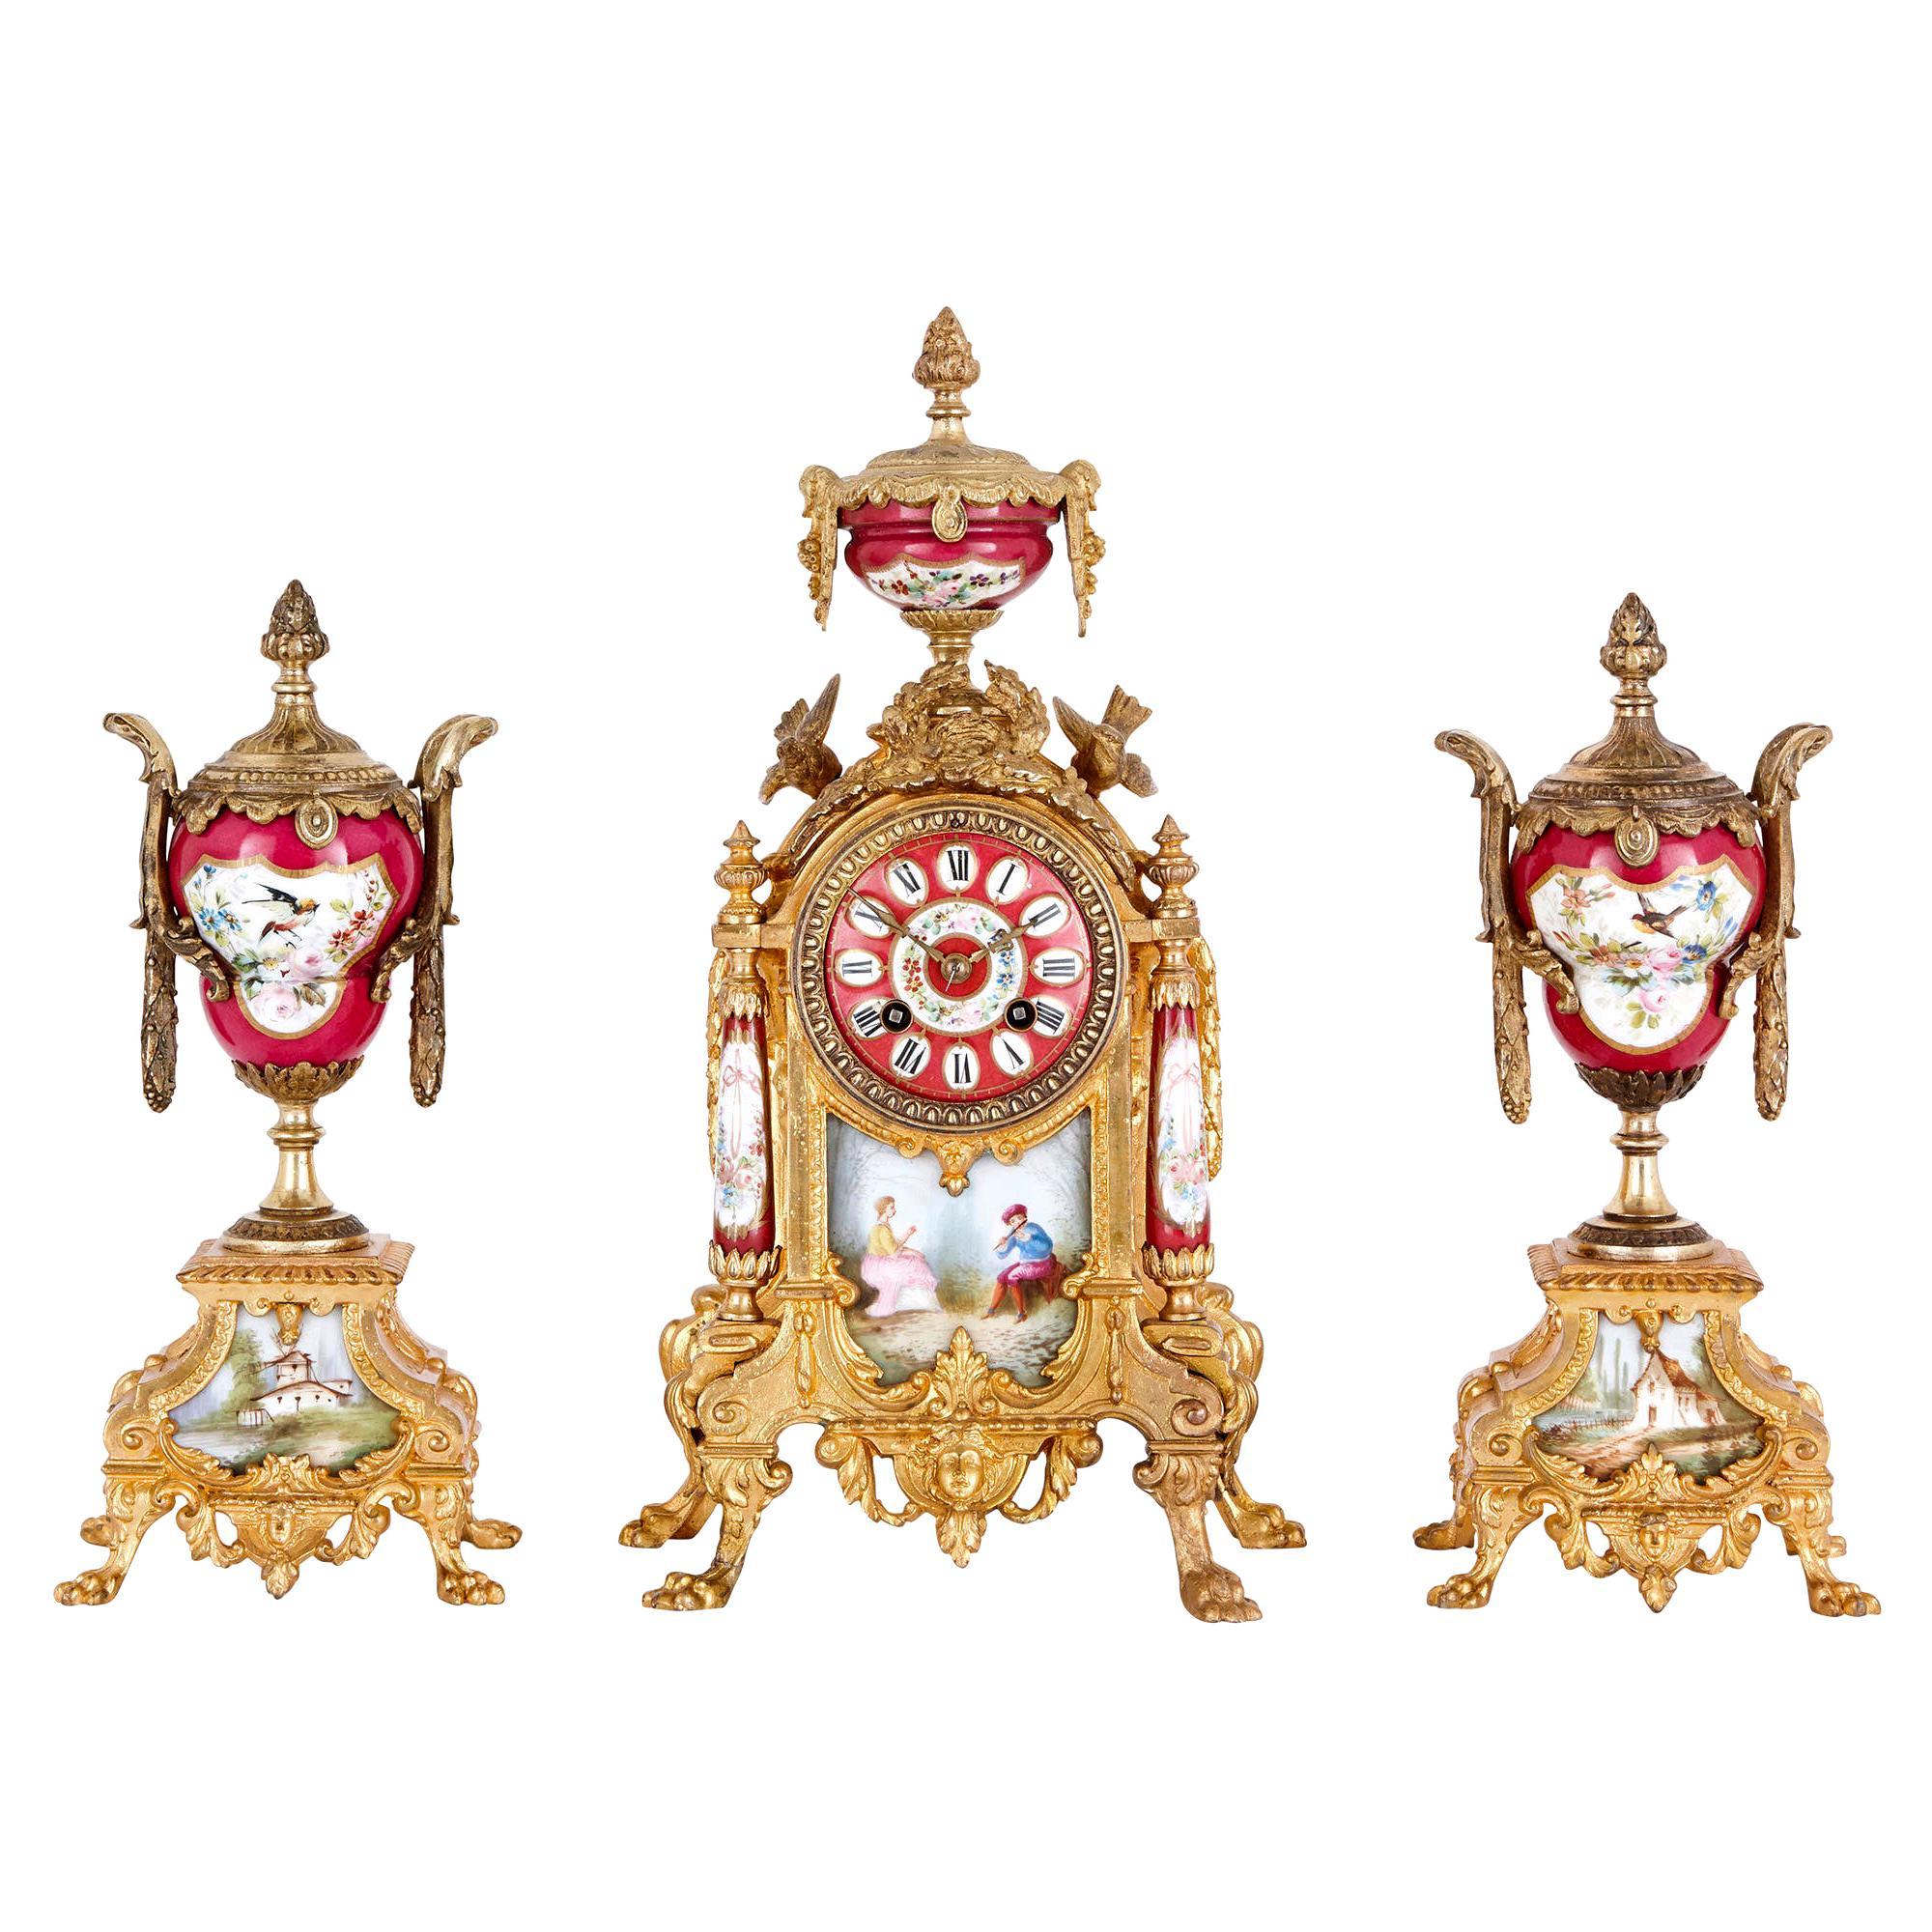 Antique Porcelain Mounted Gilt Metal Clock Set